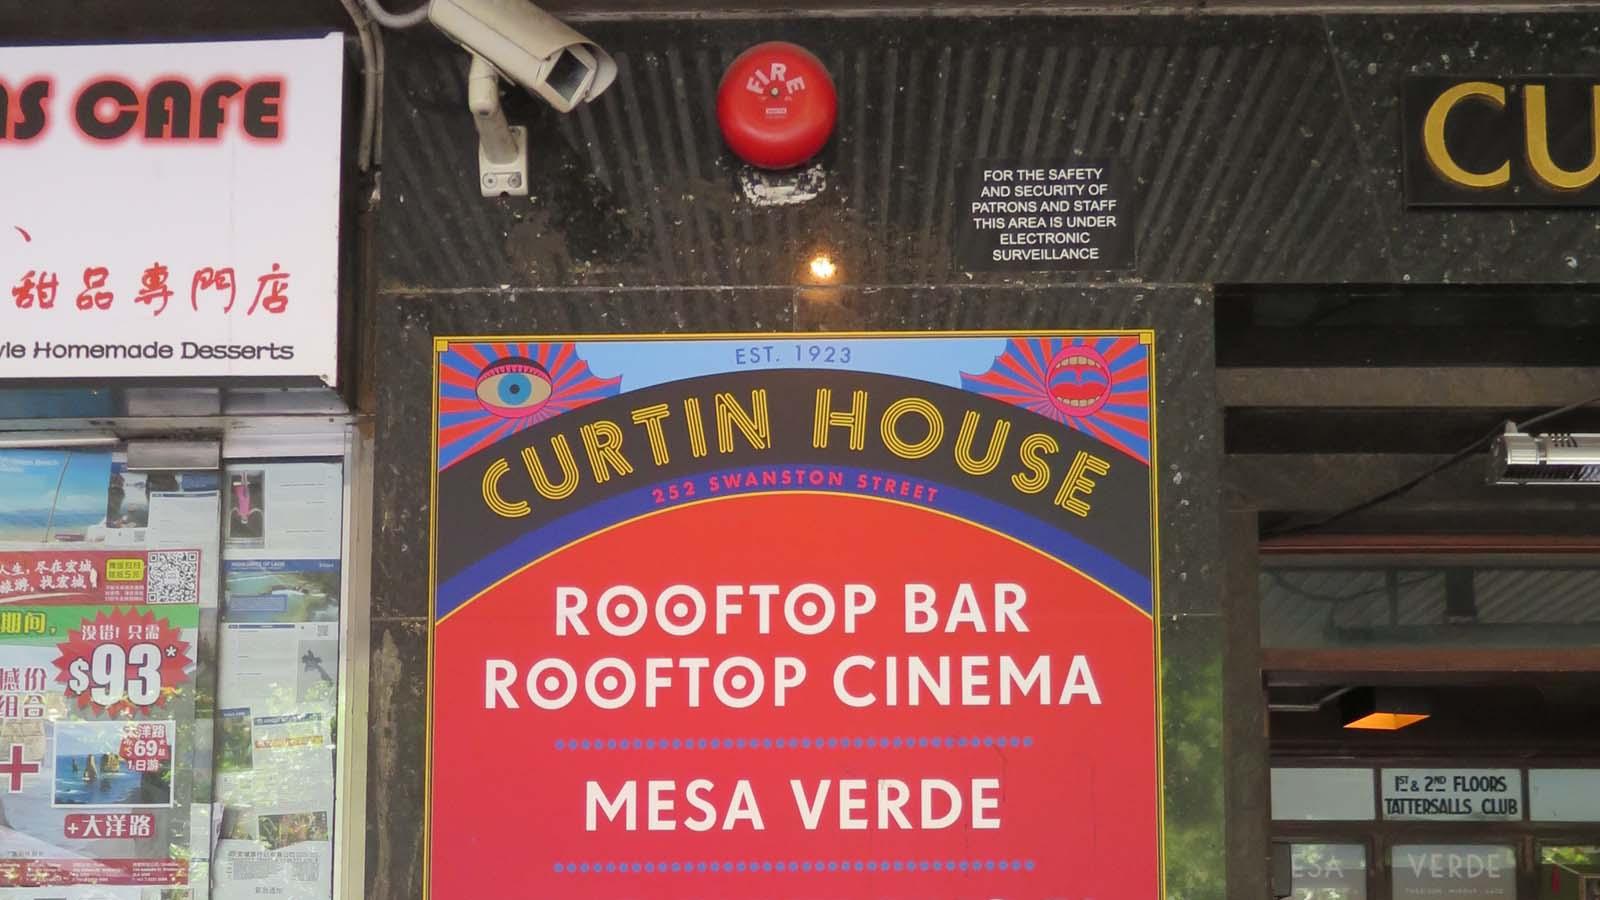 Curtin House, Melbourne, Victoria, Australia